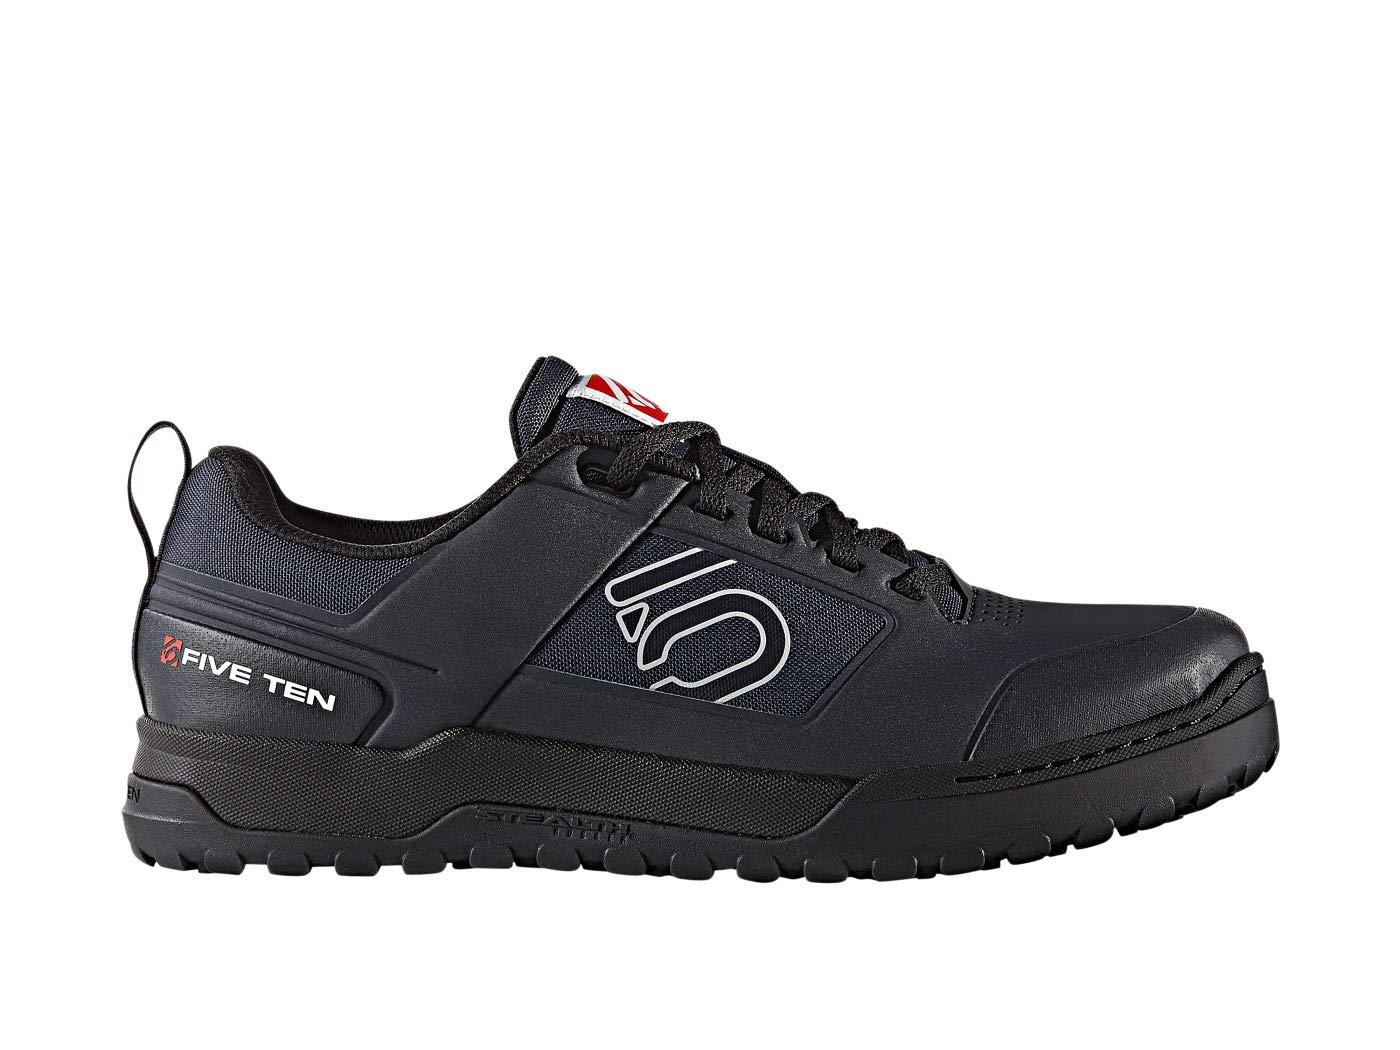 Five Ten MTB-Schuhe Impact Pro Blau Gr. 45